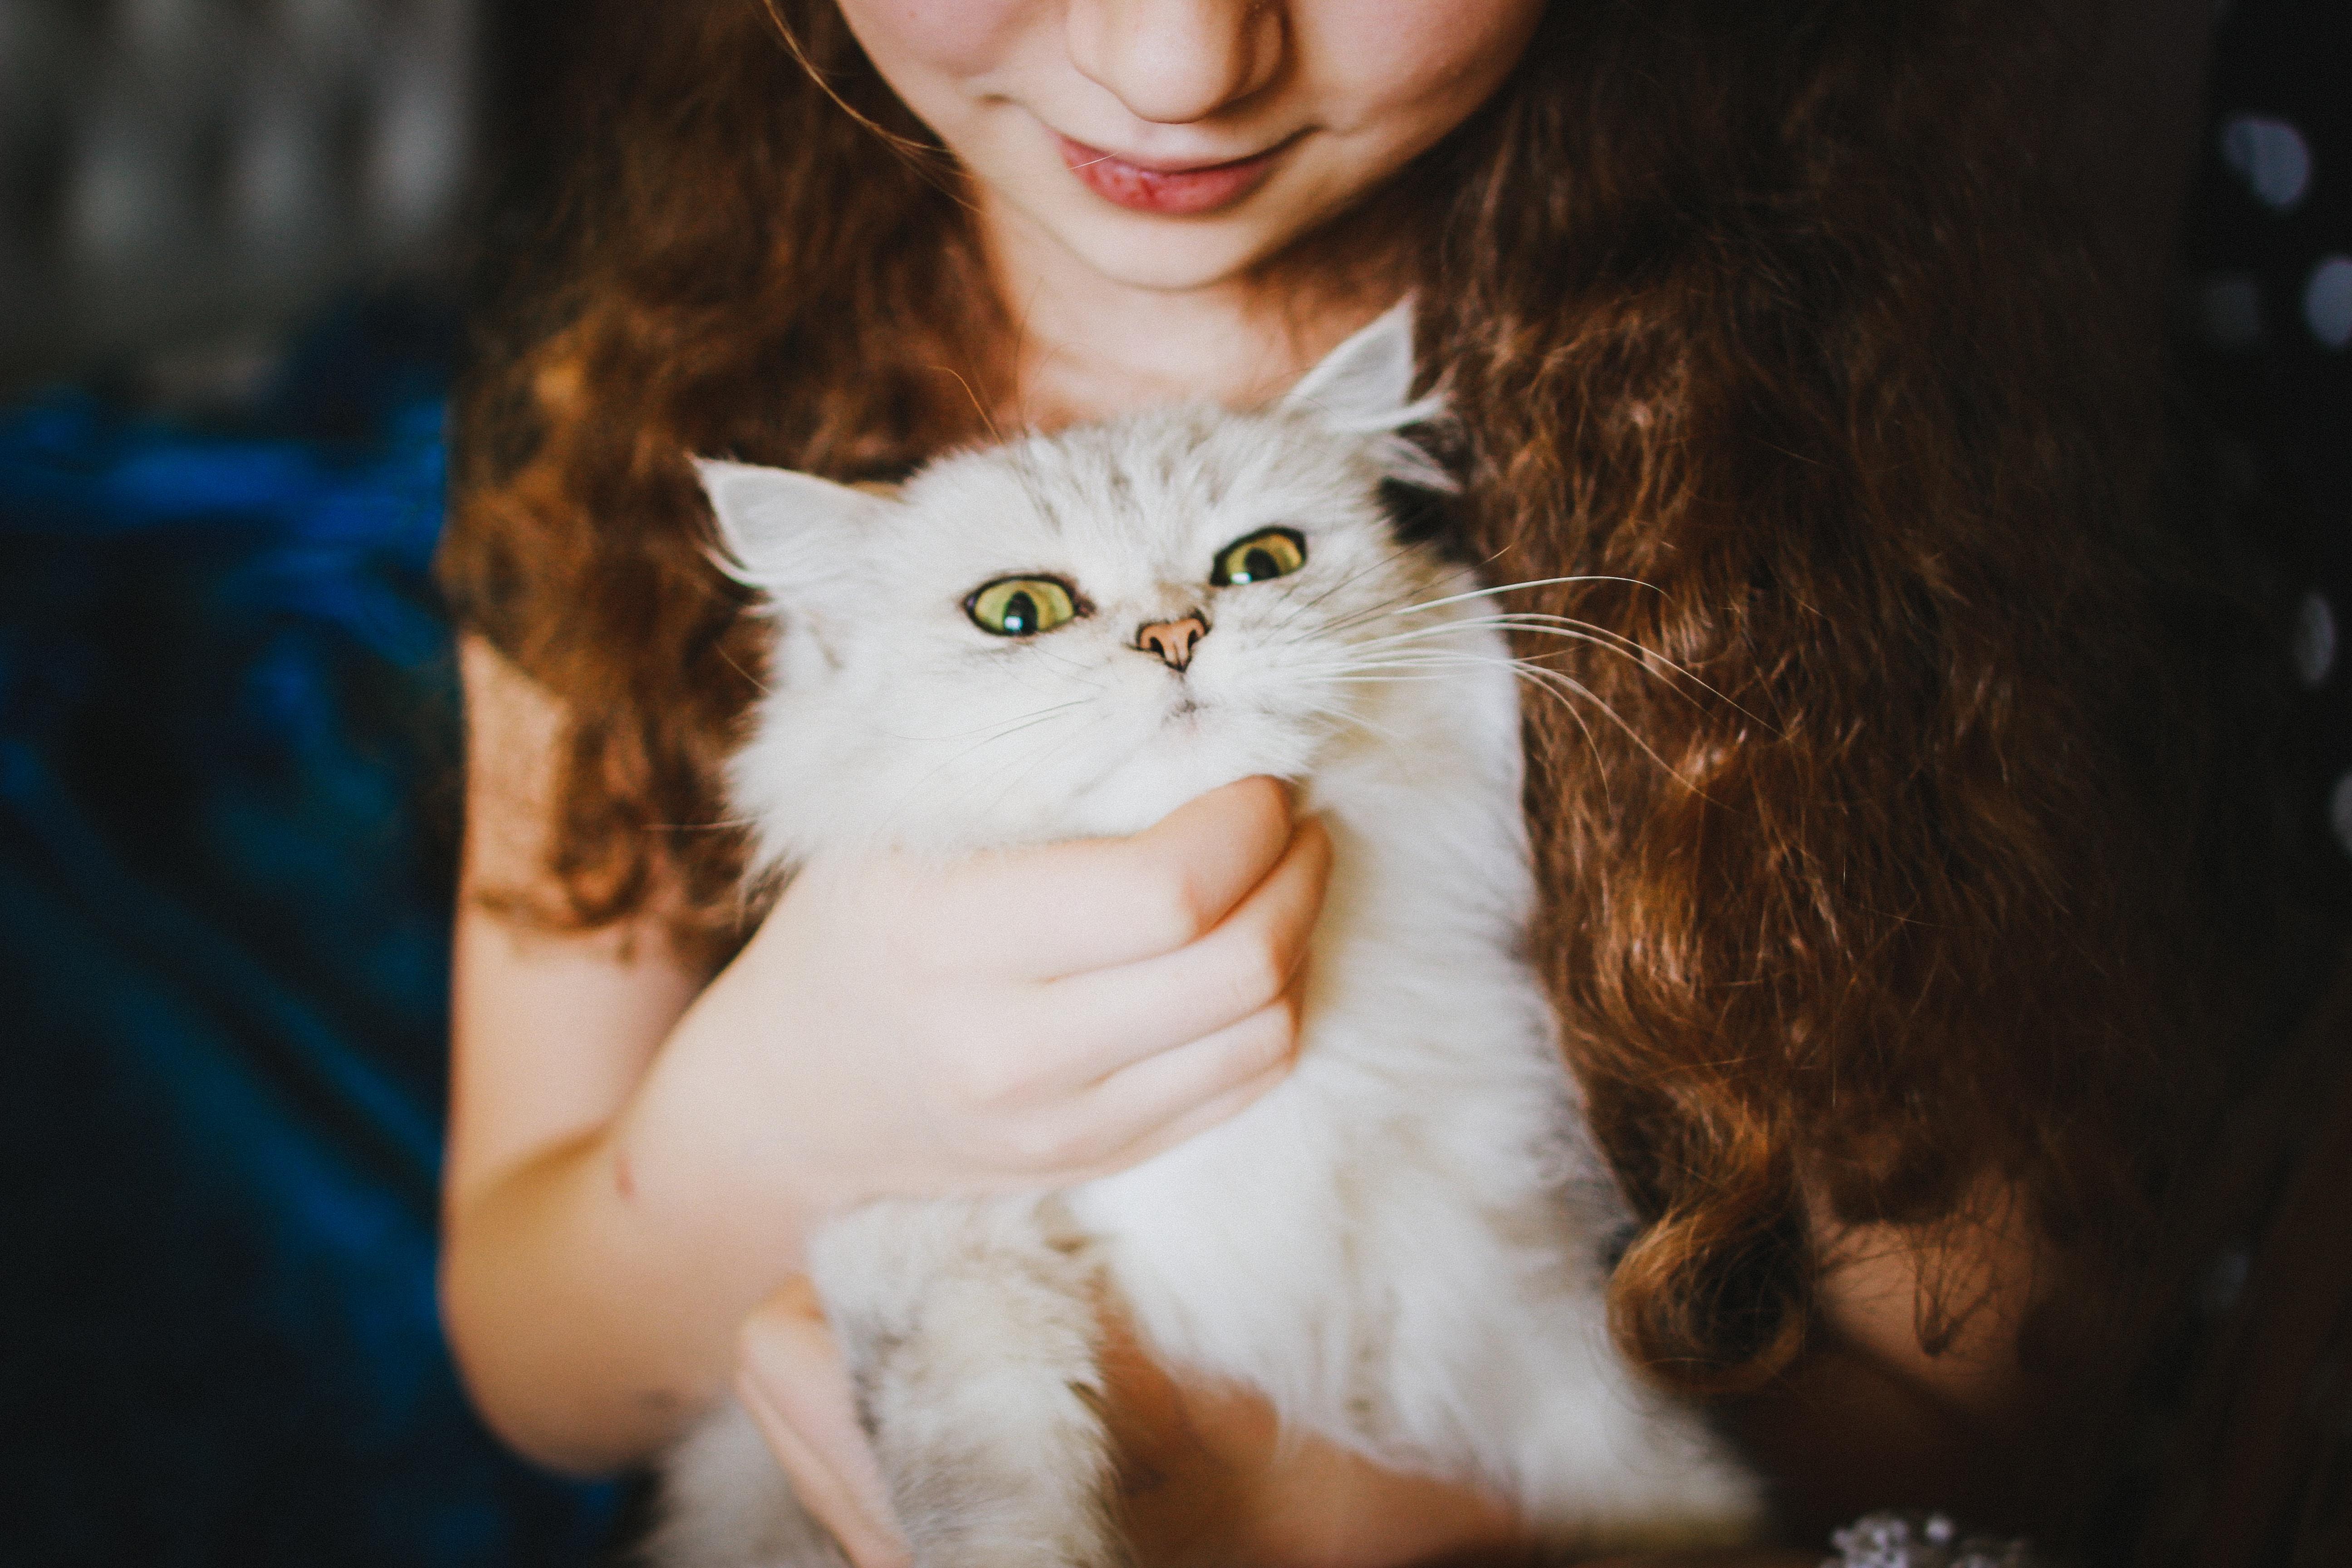 veronika-homchis-Child & Cat-unsplash